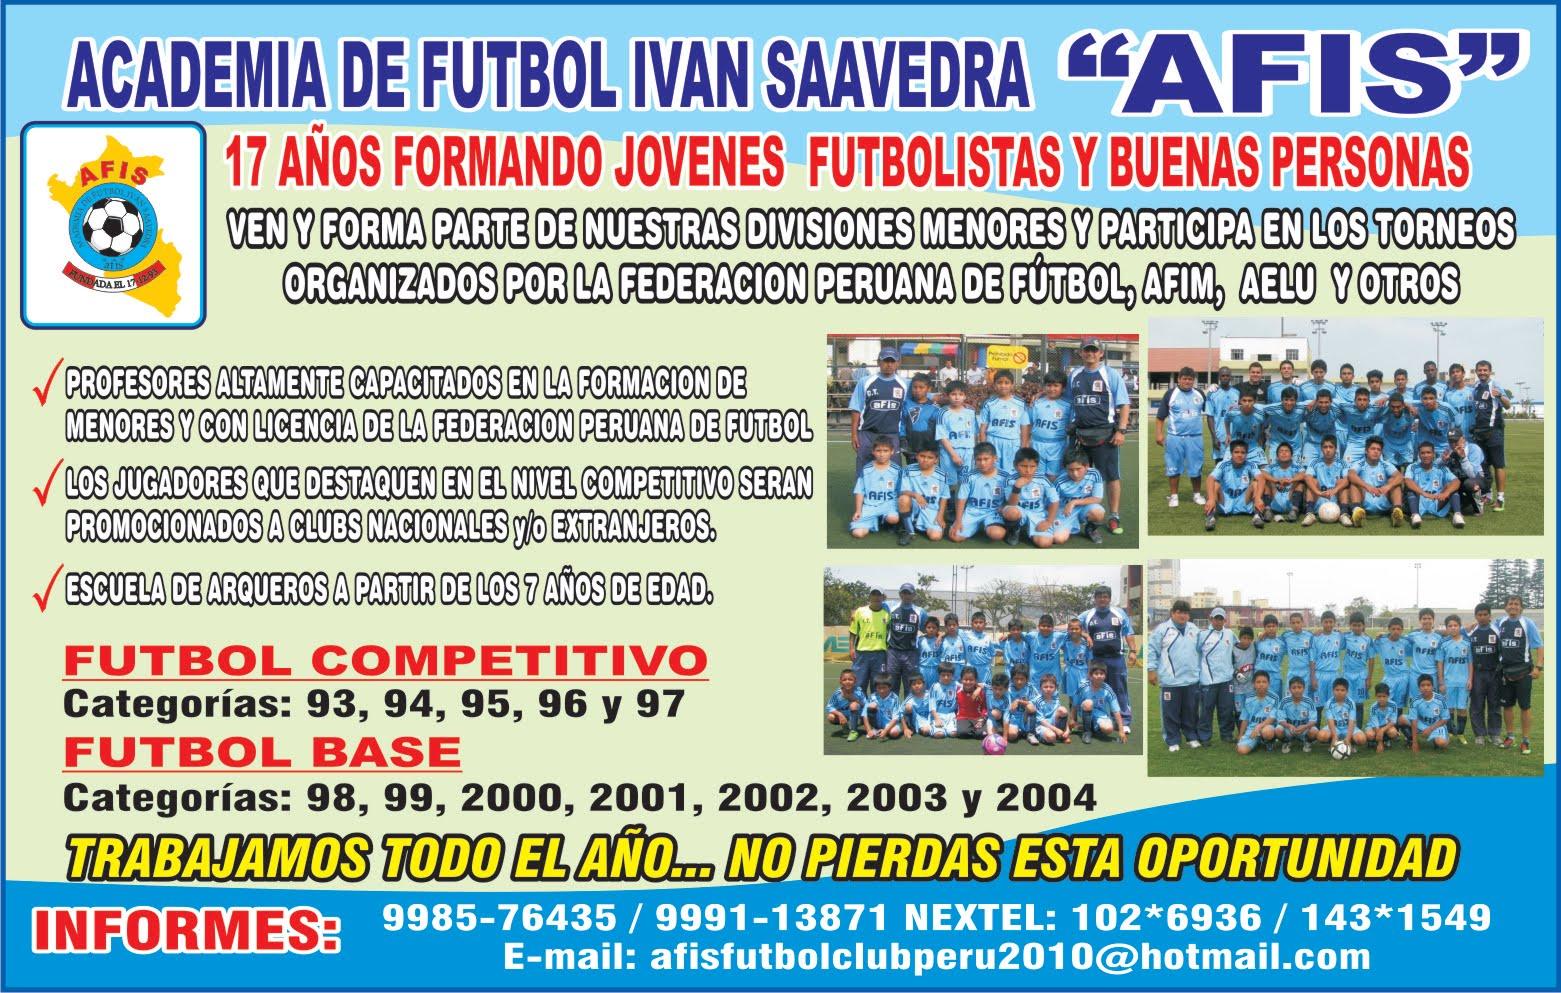 "ACADEMIA DE FUTBOL IVAN SAAVEDRA ""AFIS"""